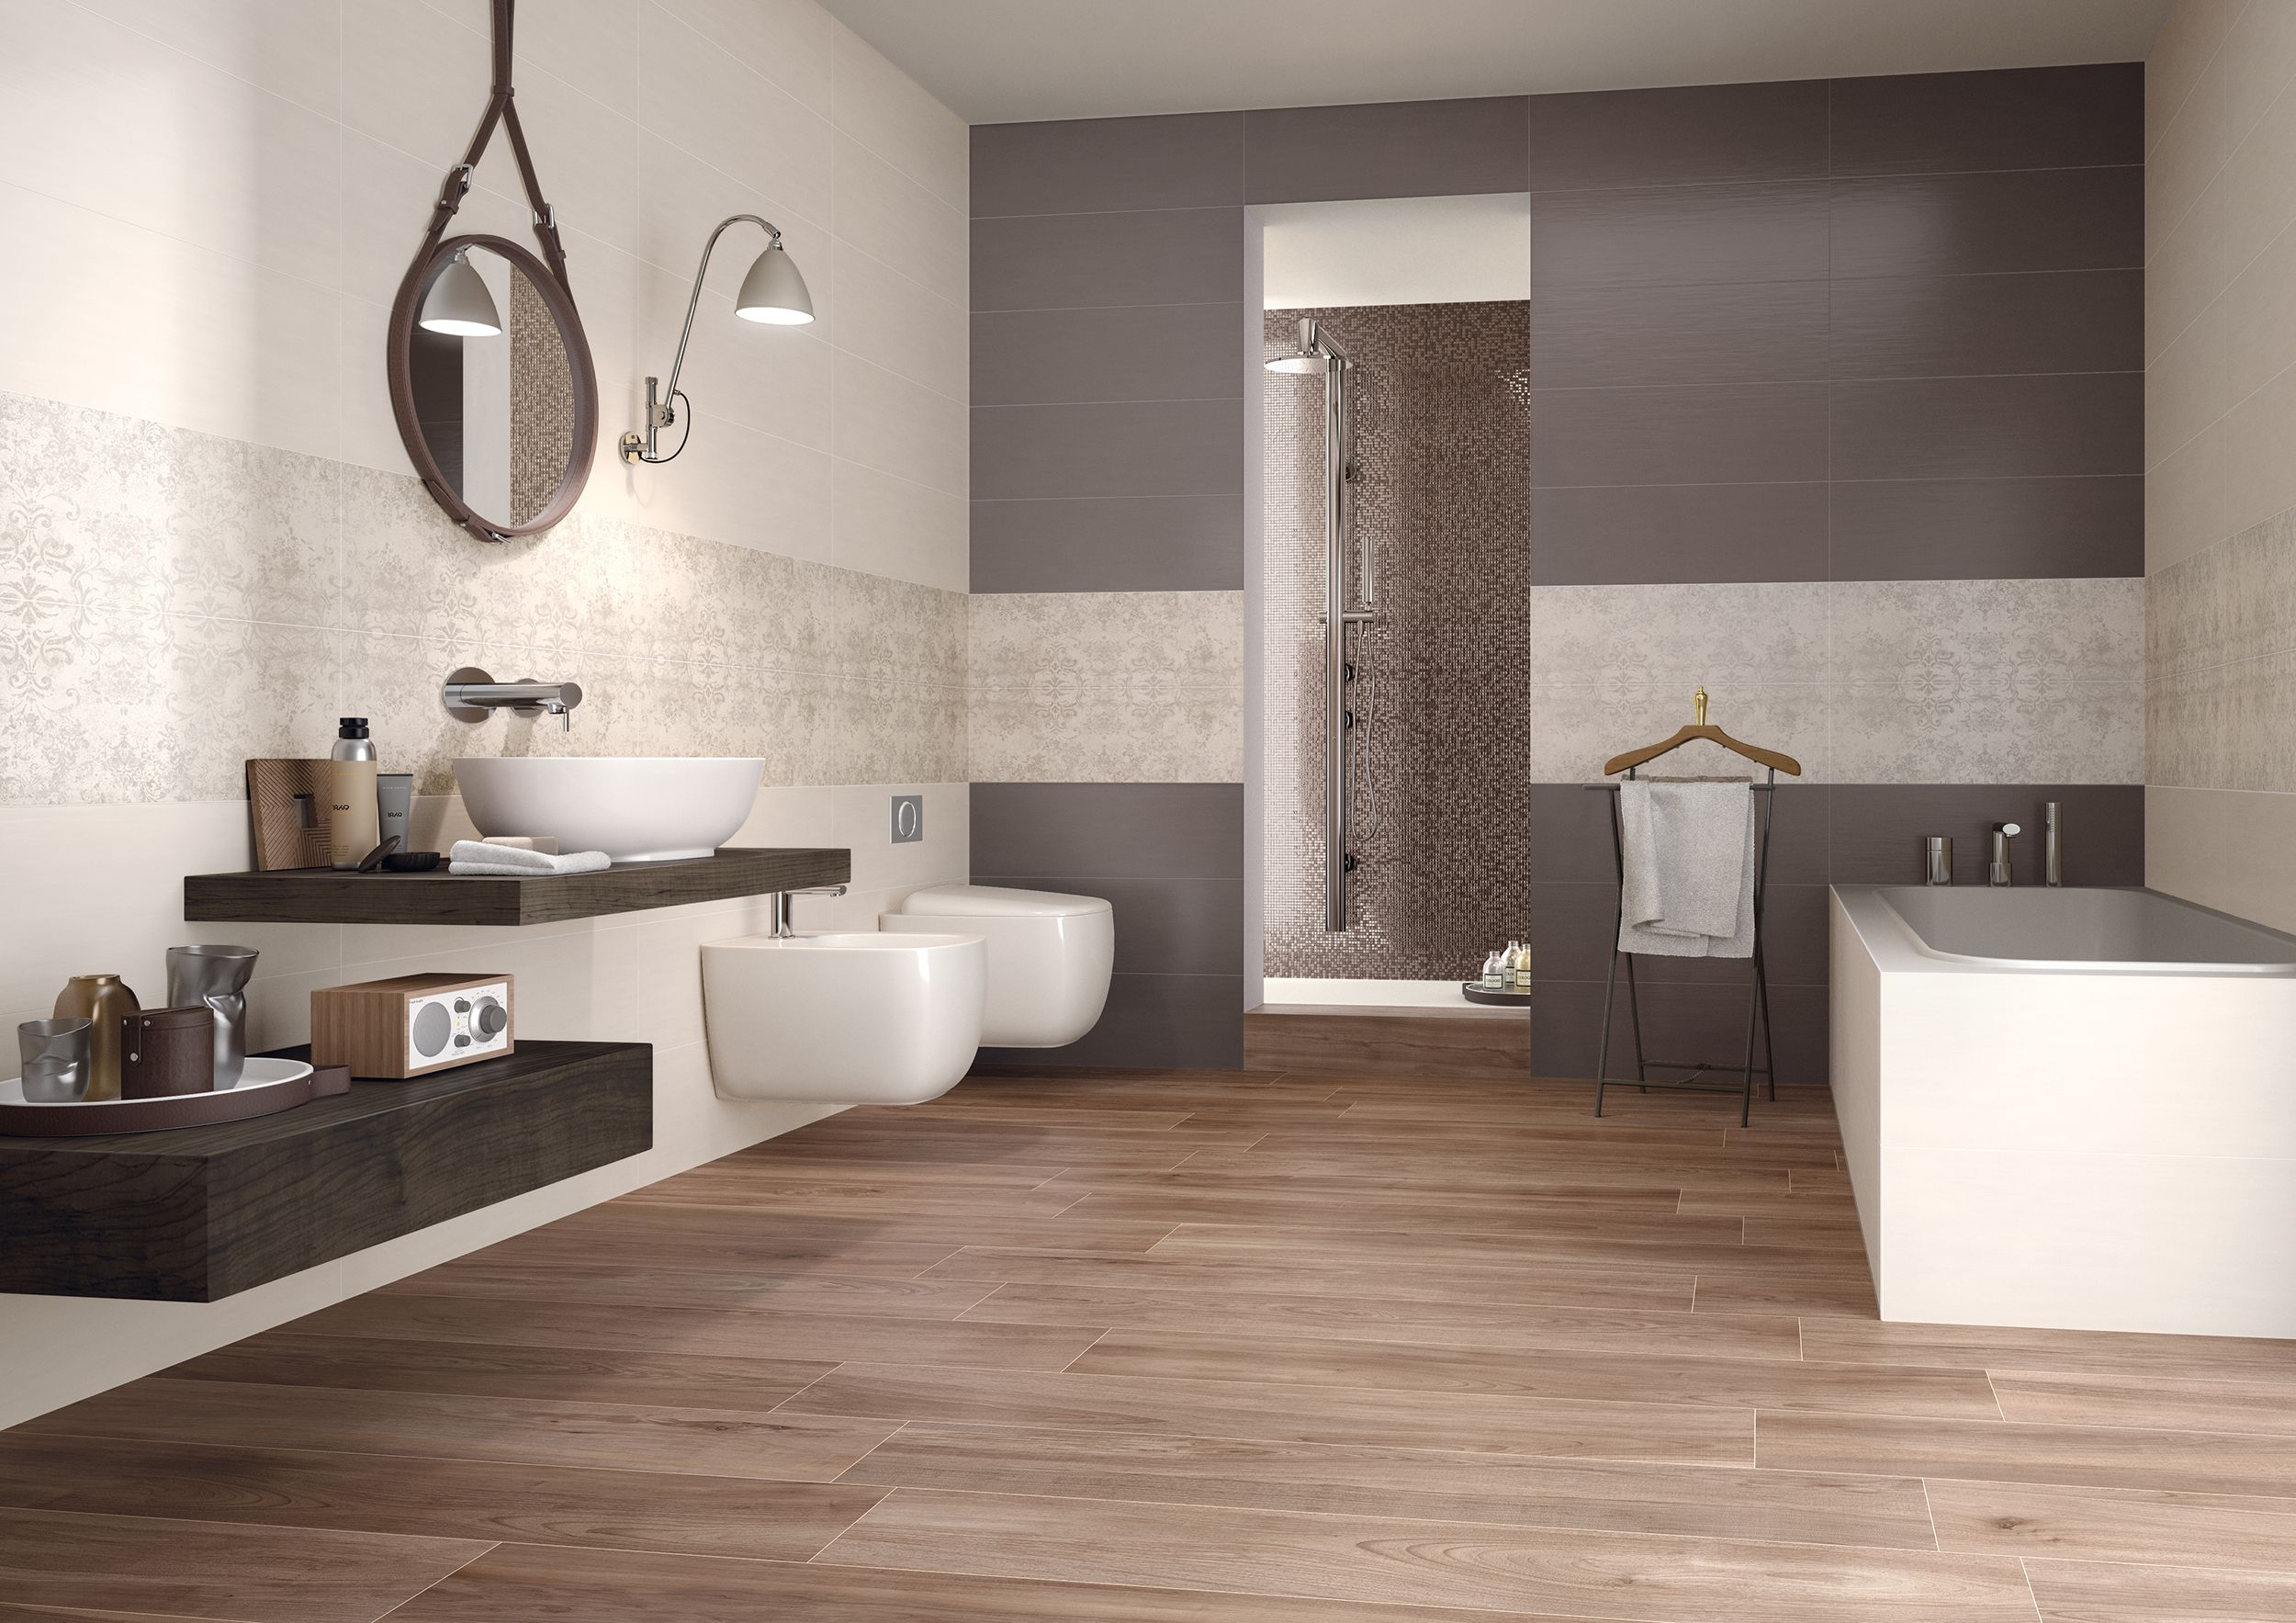 Pin di erica su rivestimento ba os casas e mosaicos - Piastrelle per il bagno moderne ...